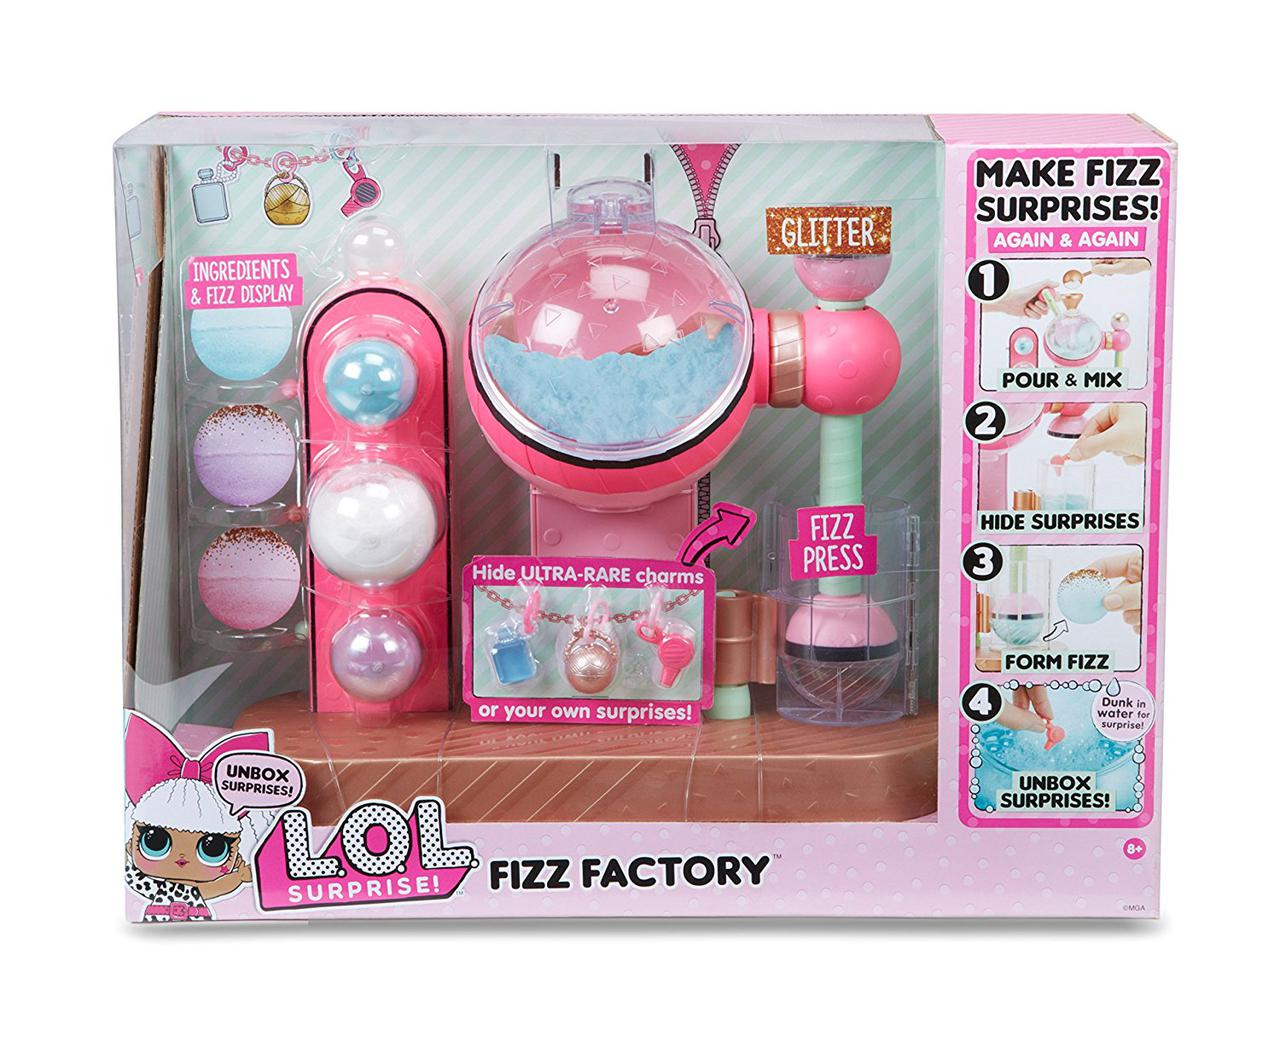 L.O.L. Фабрика по изготовлению бомбочек Лол L.O.L. Surprise! Fizz Maker Playset